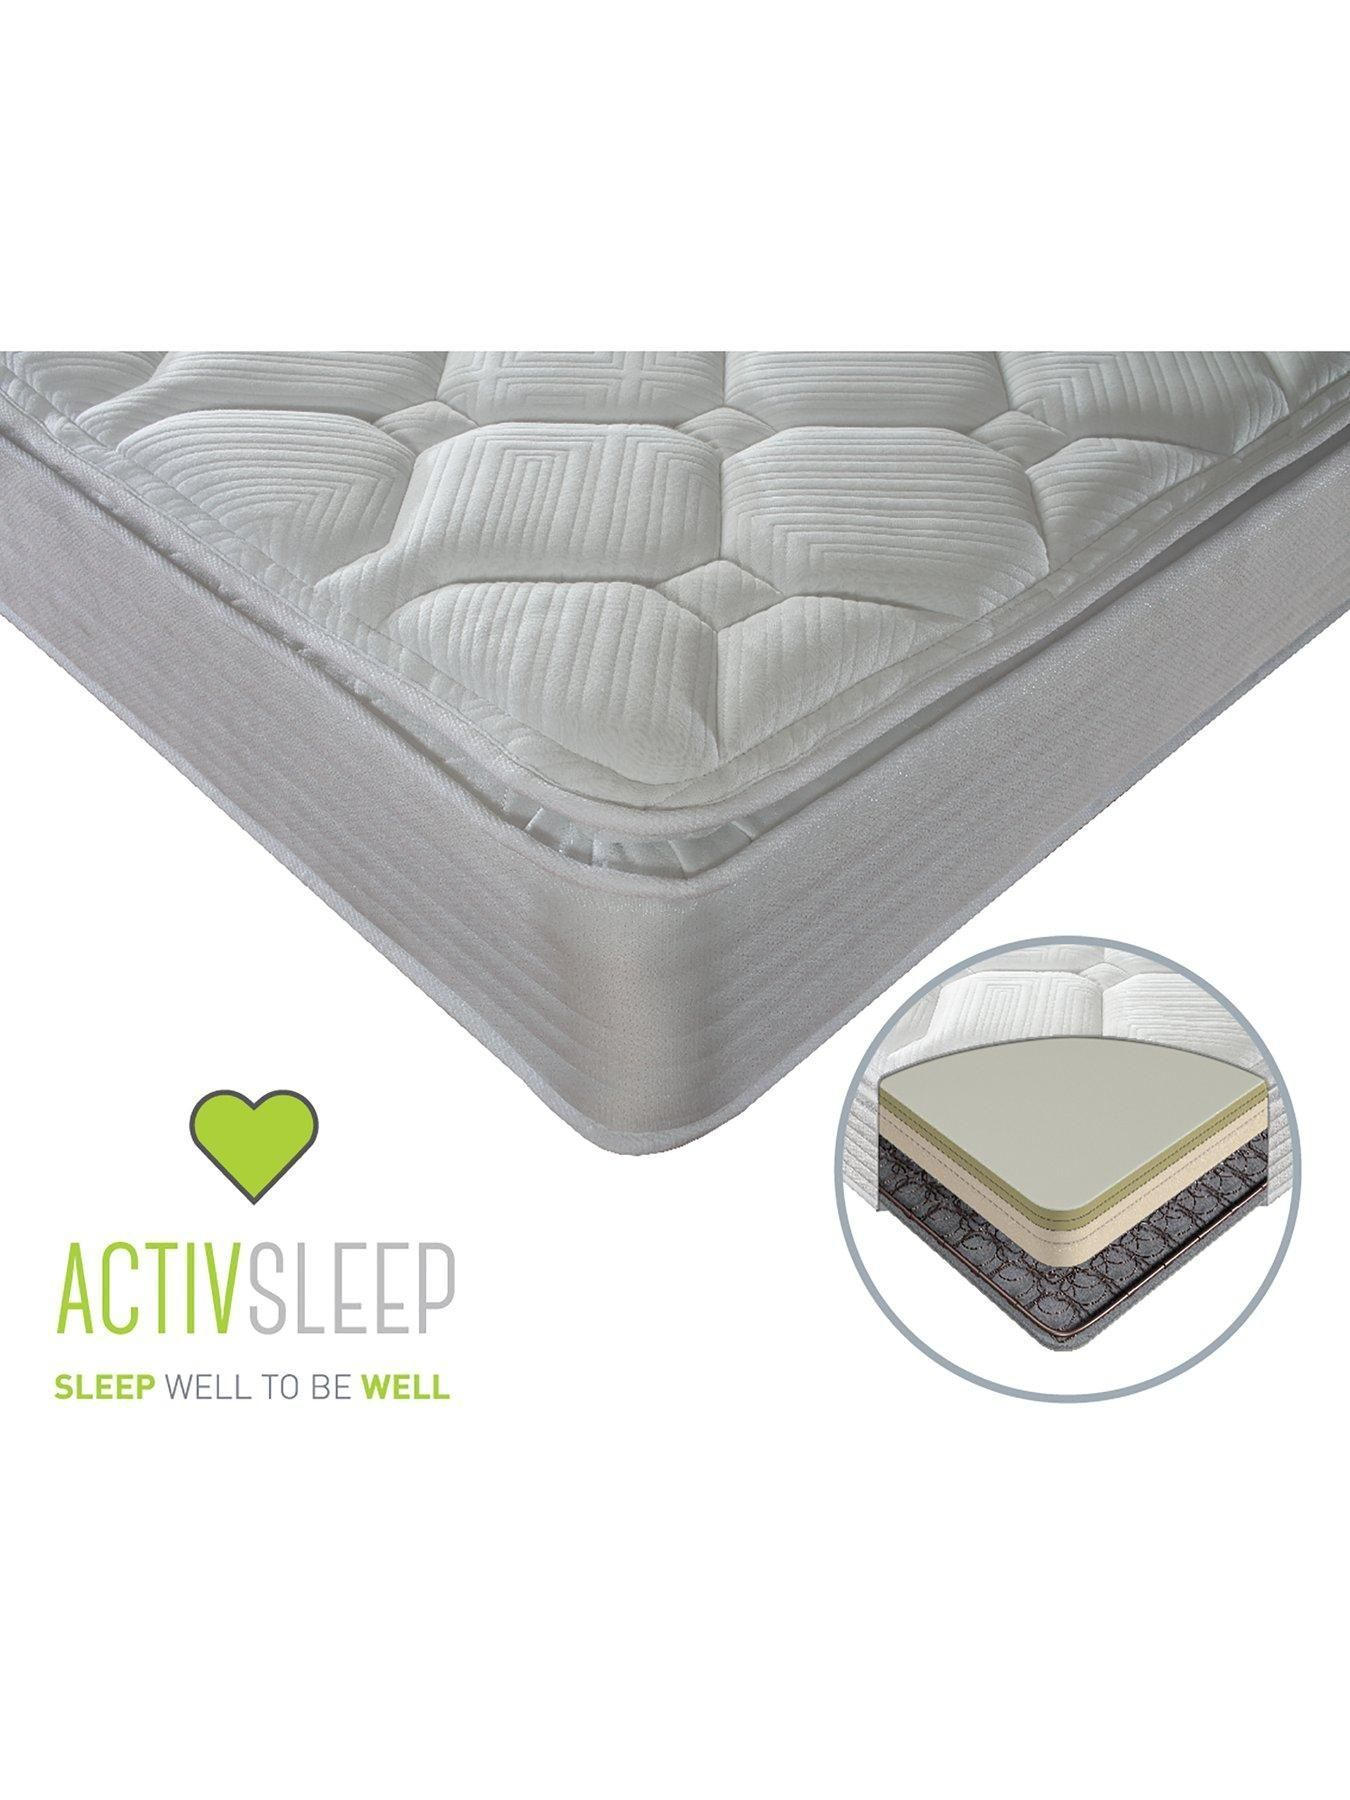 Sealy Activ Renew Ortho Posture Pillow Top Mattress Medium Firm